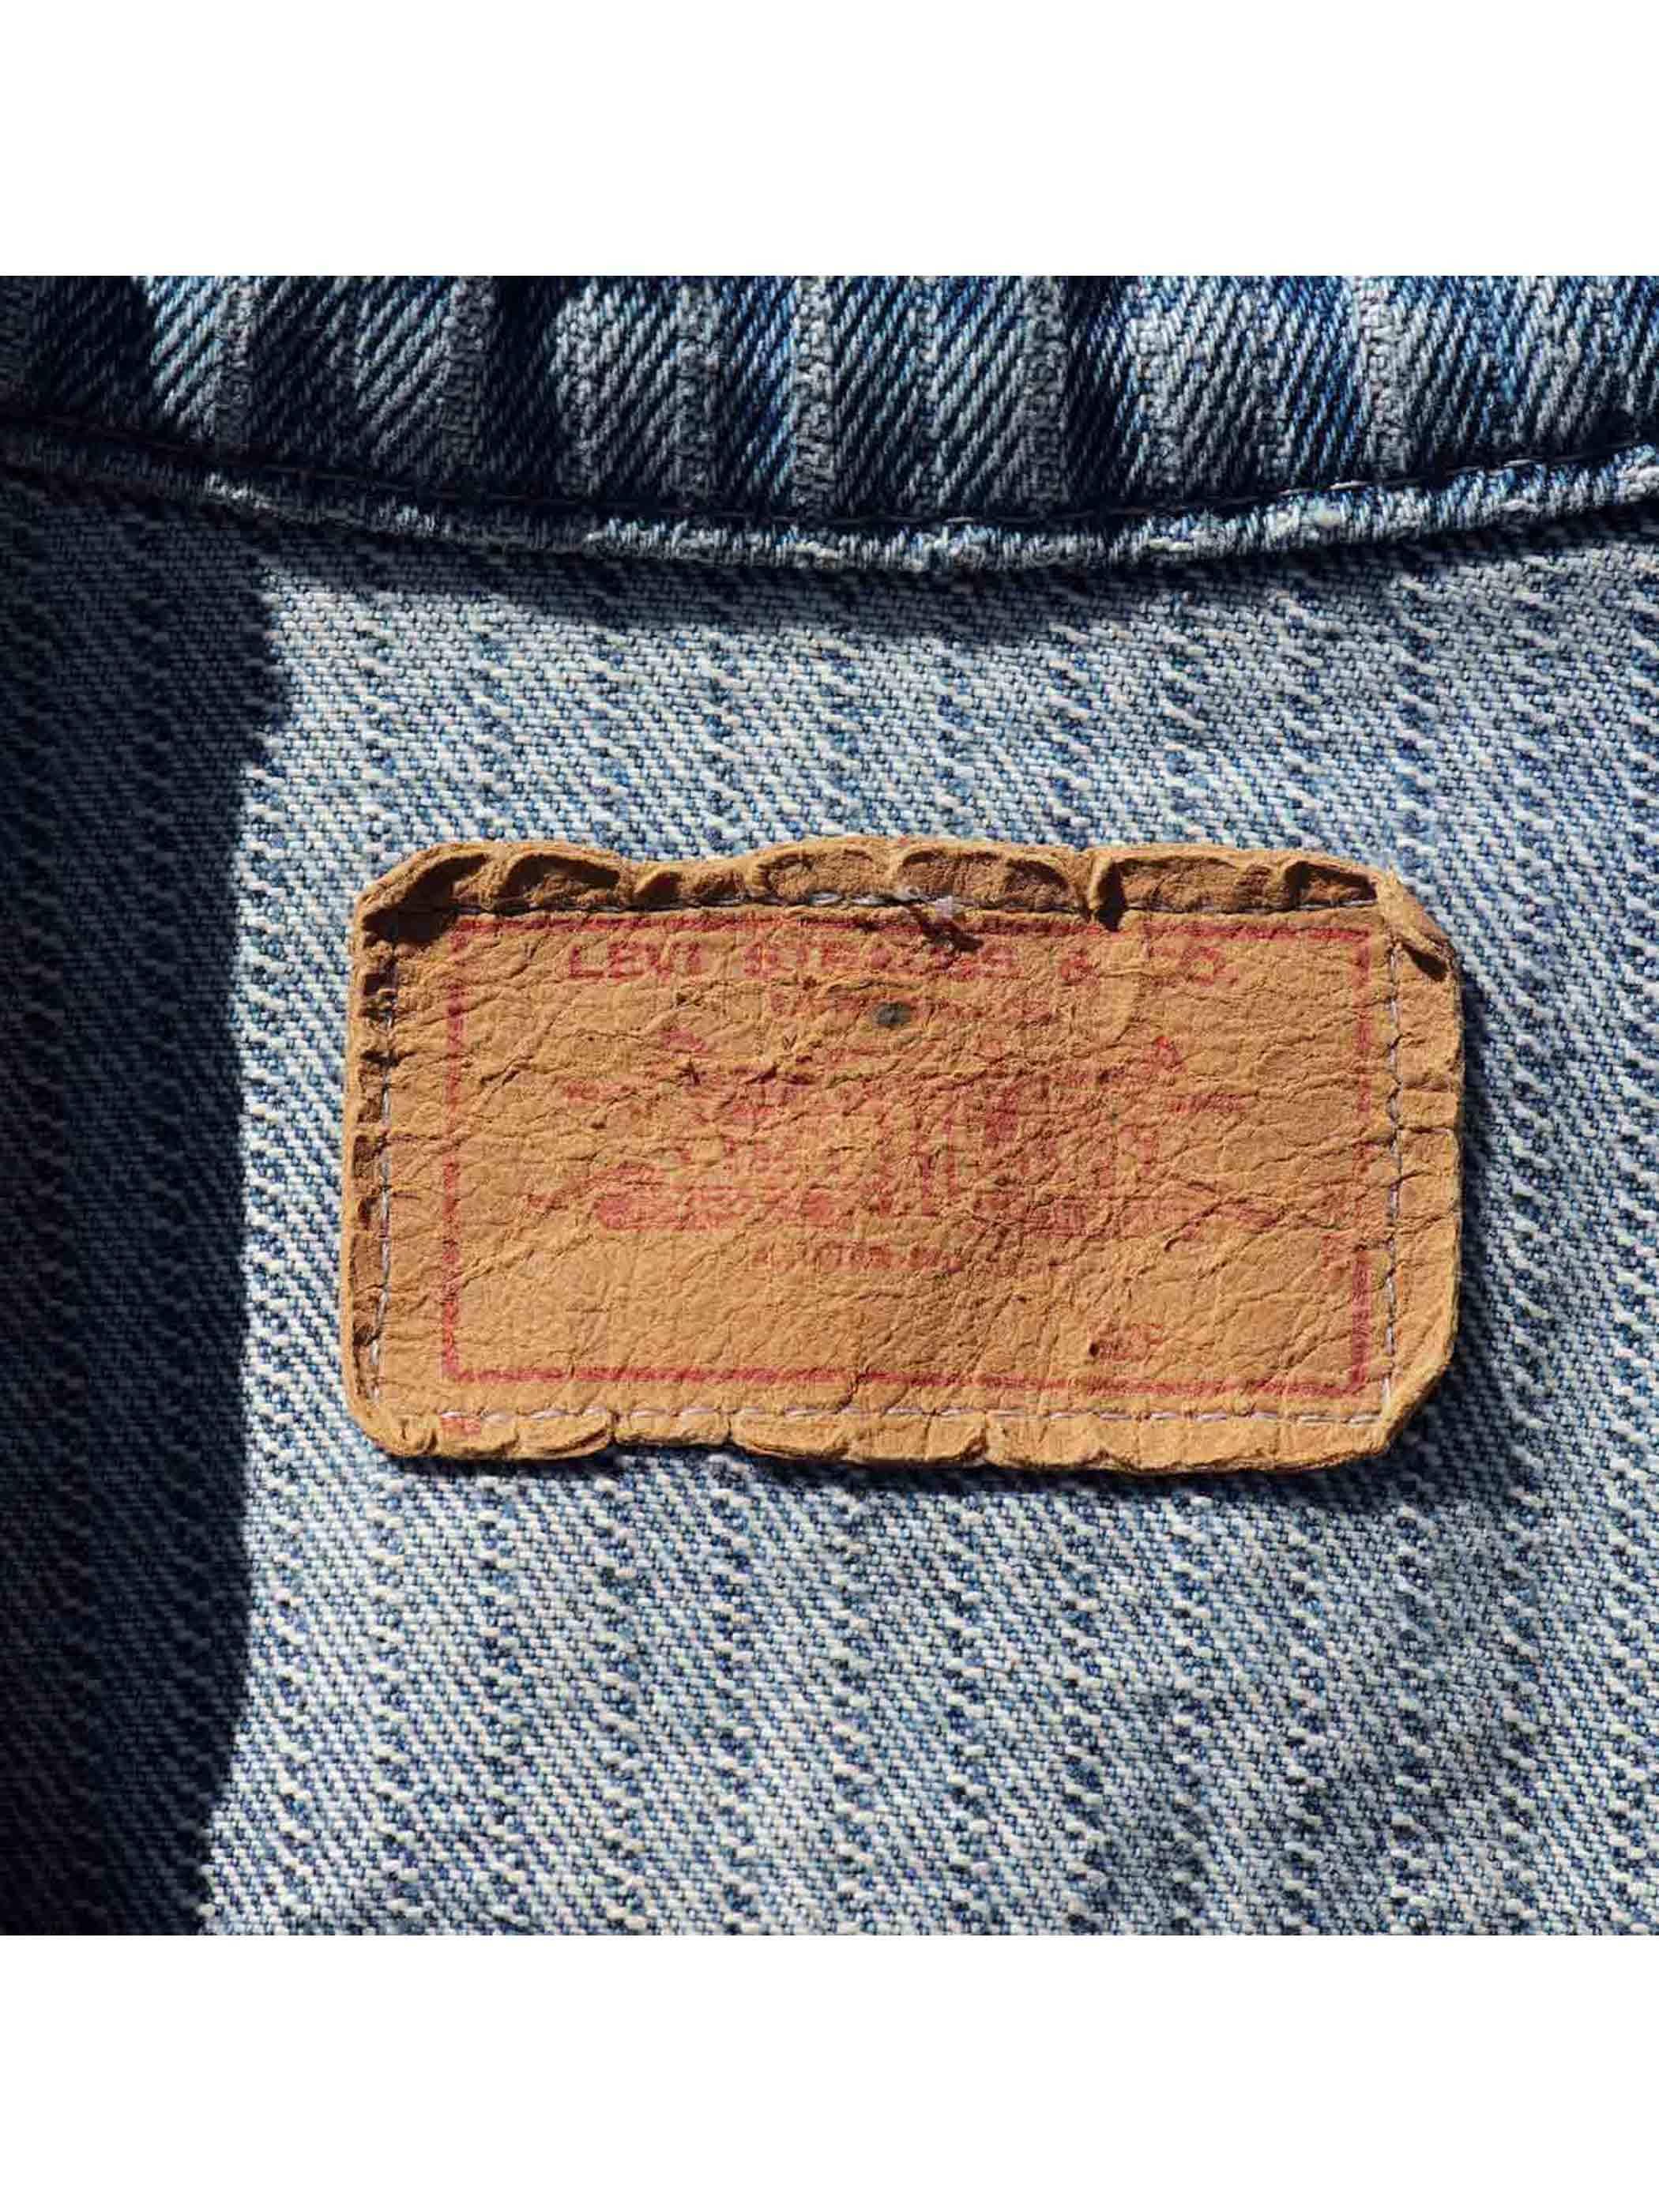 "80's LEVI'S ""70506 / STRIPE DENIM"" Trucker Jacket [About 44]"